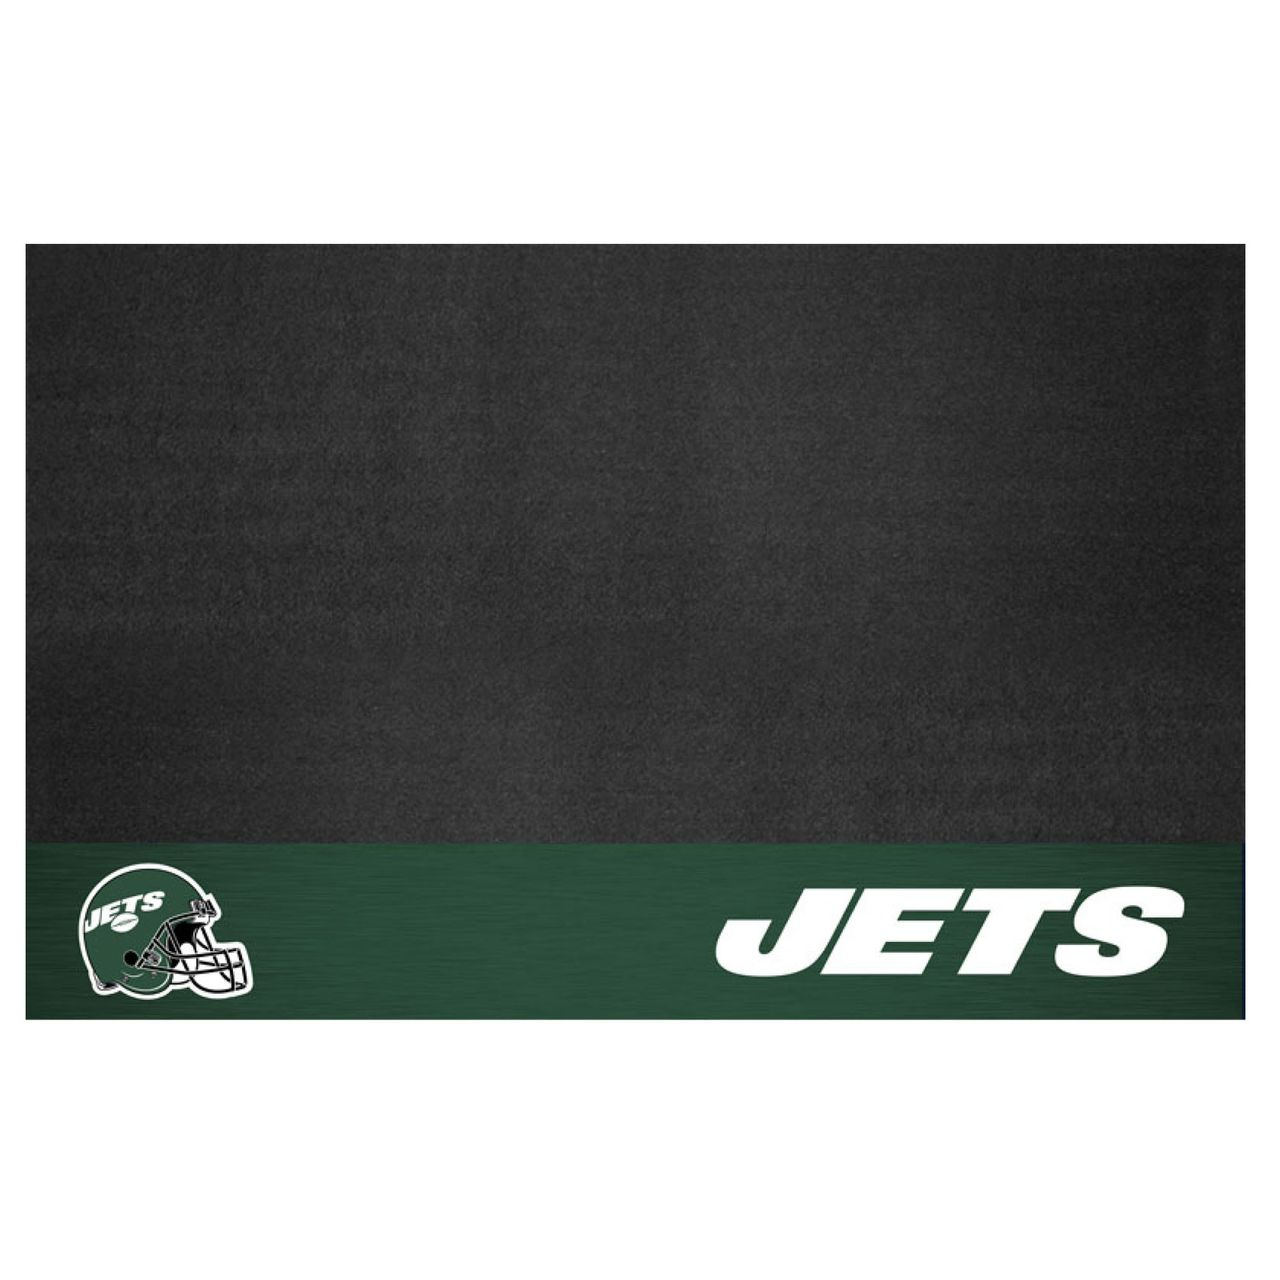 "Fanmats 12195 NFL - New York Jets Grill Mat 26""x42"""